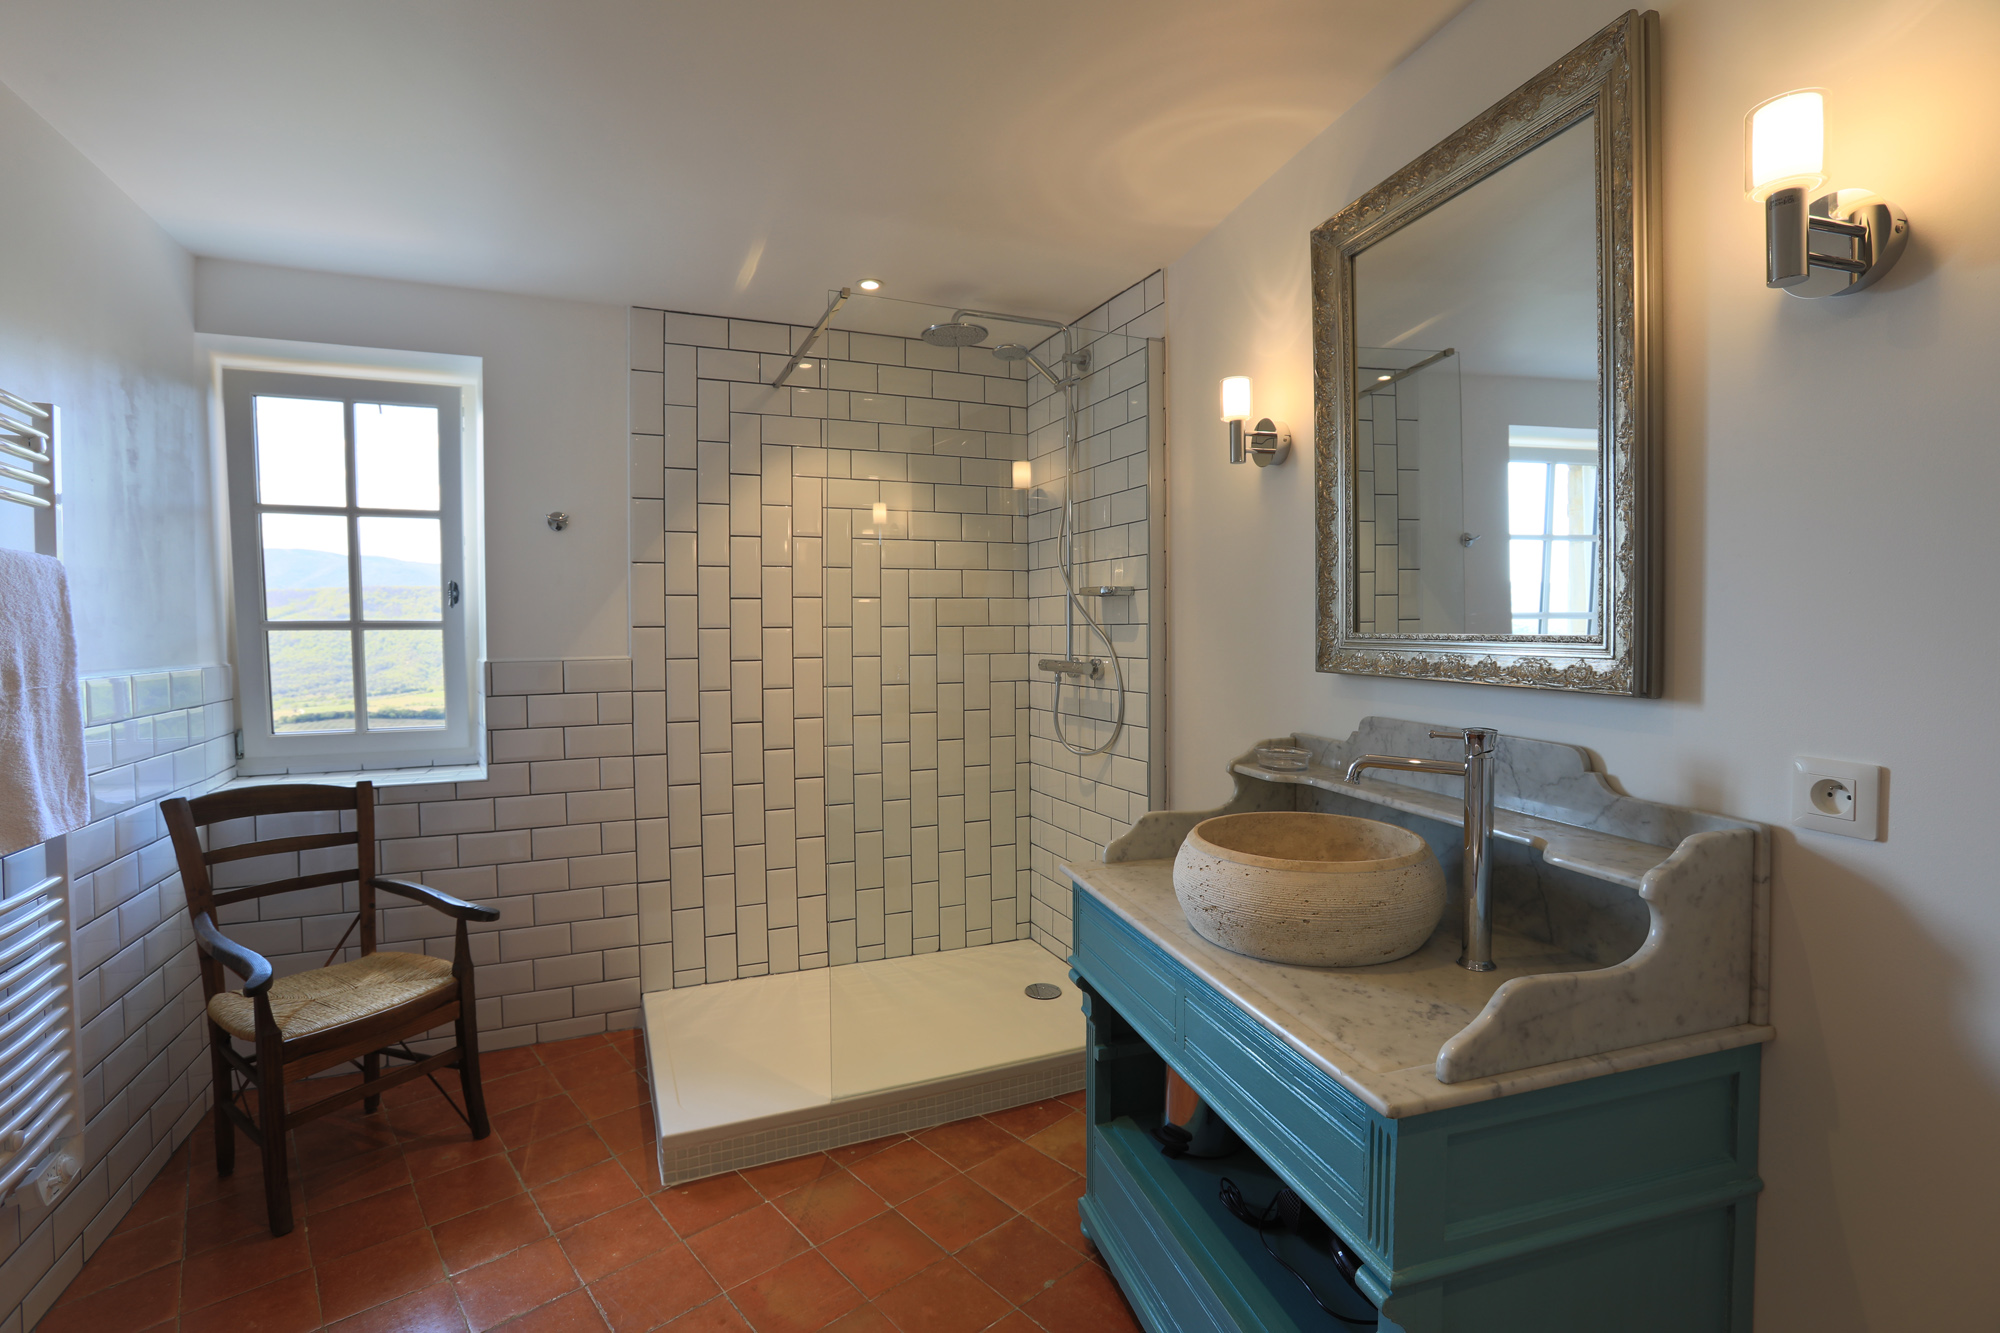 Parker bathroom